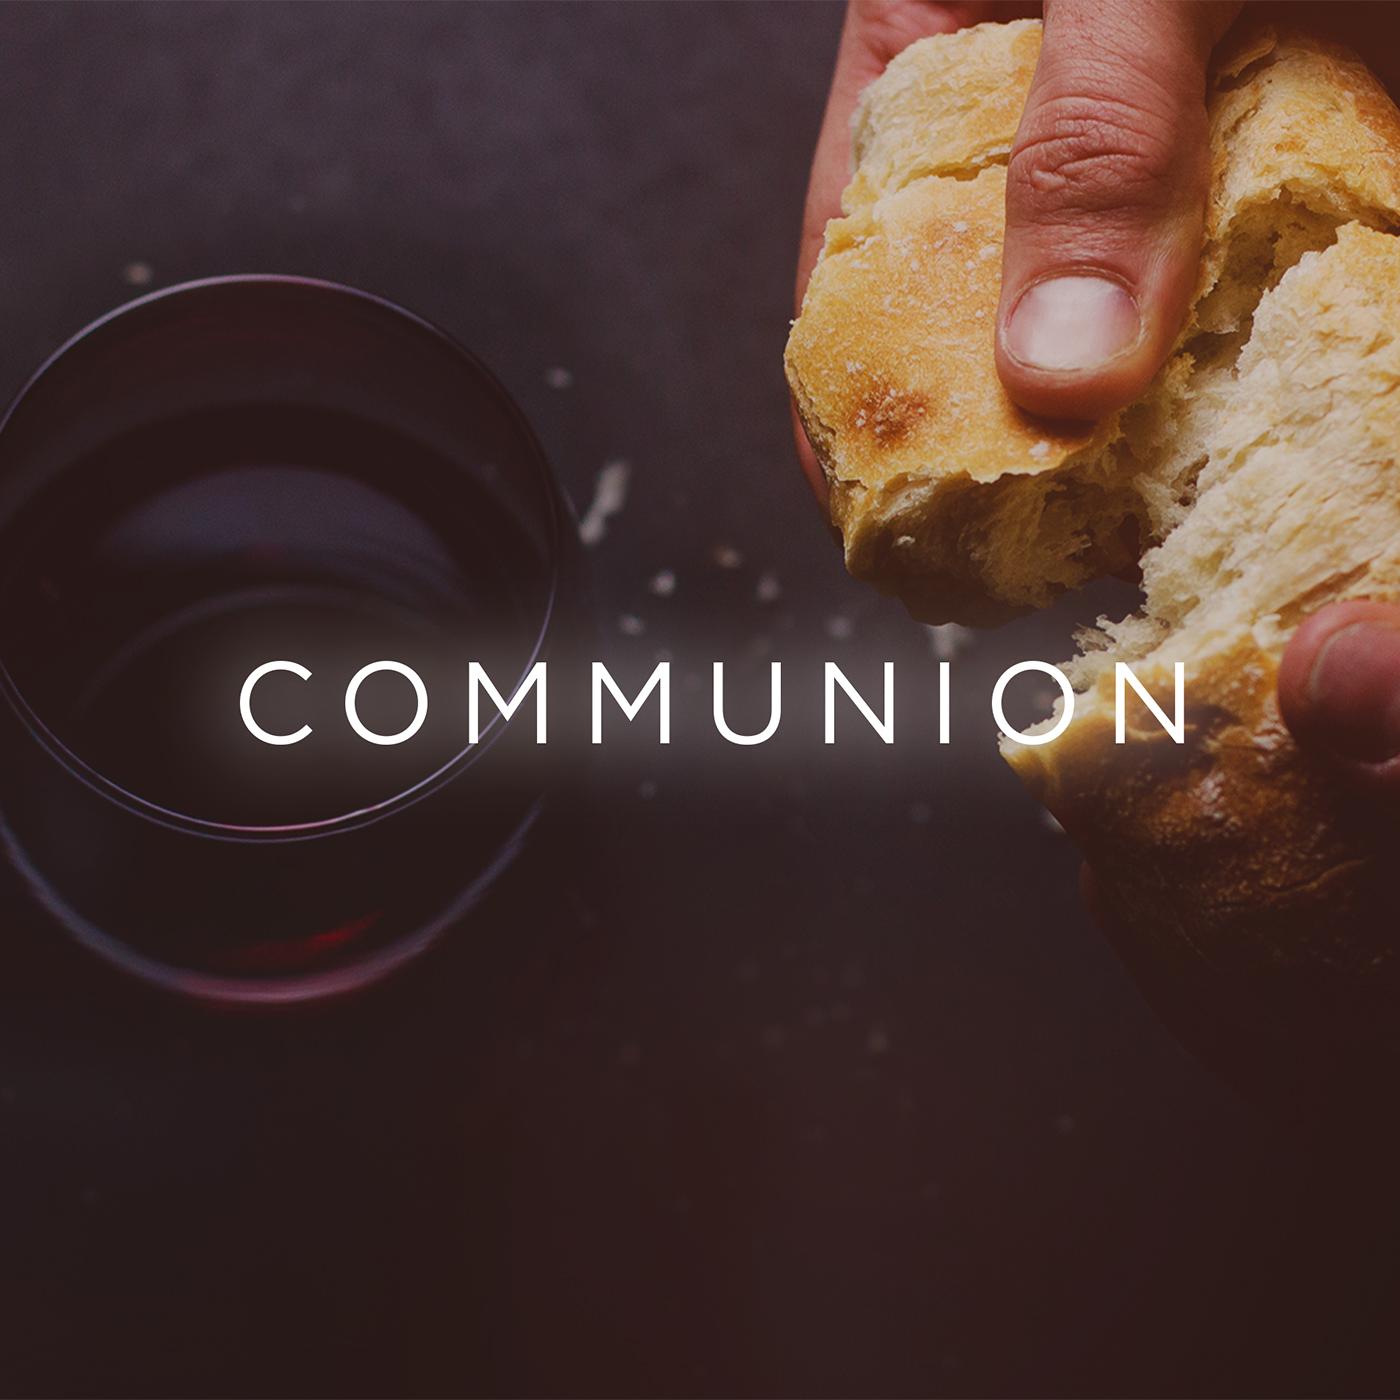 Communion Square Image.jpg